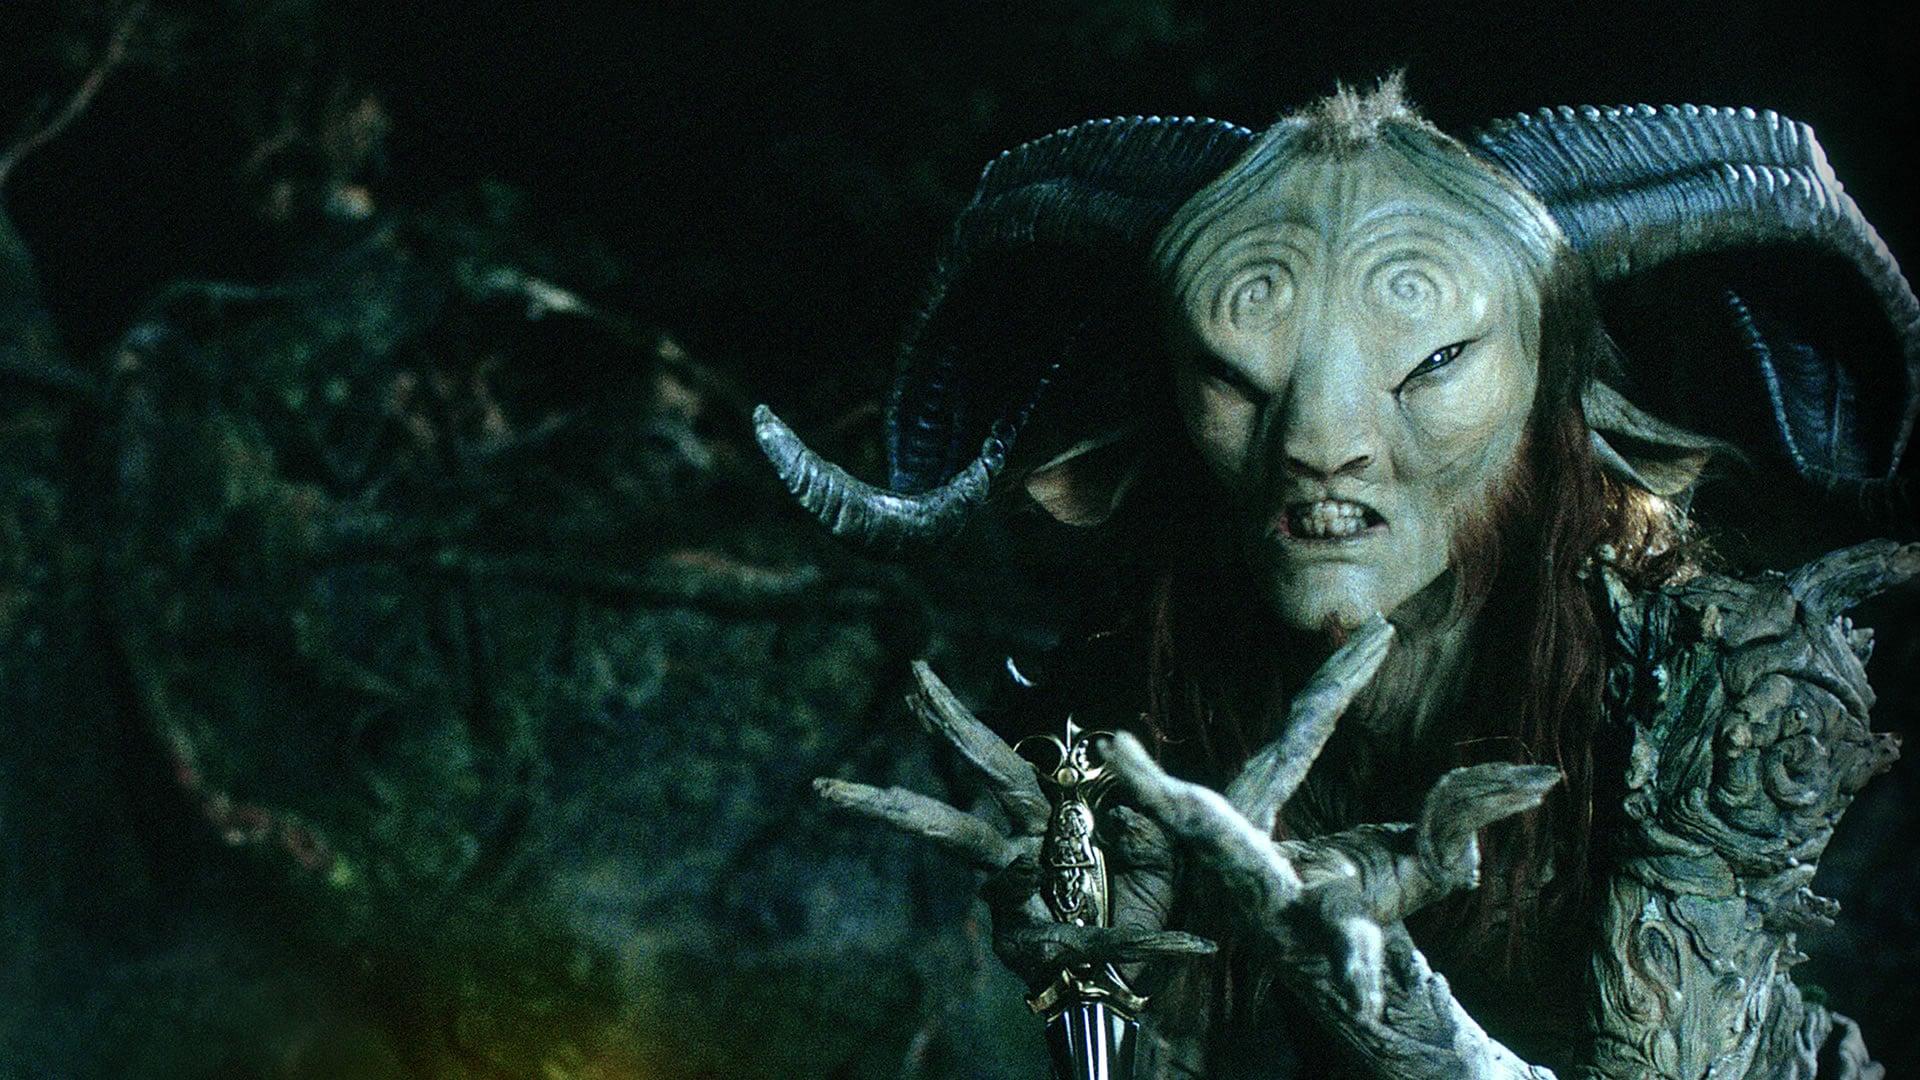 pans-labyrinth-2006.jpg